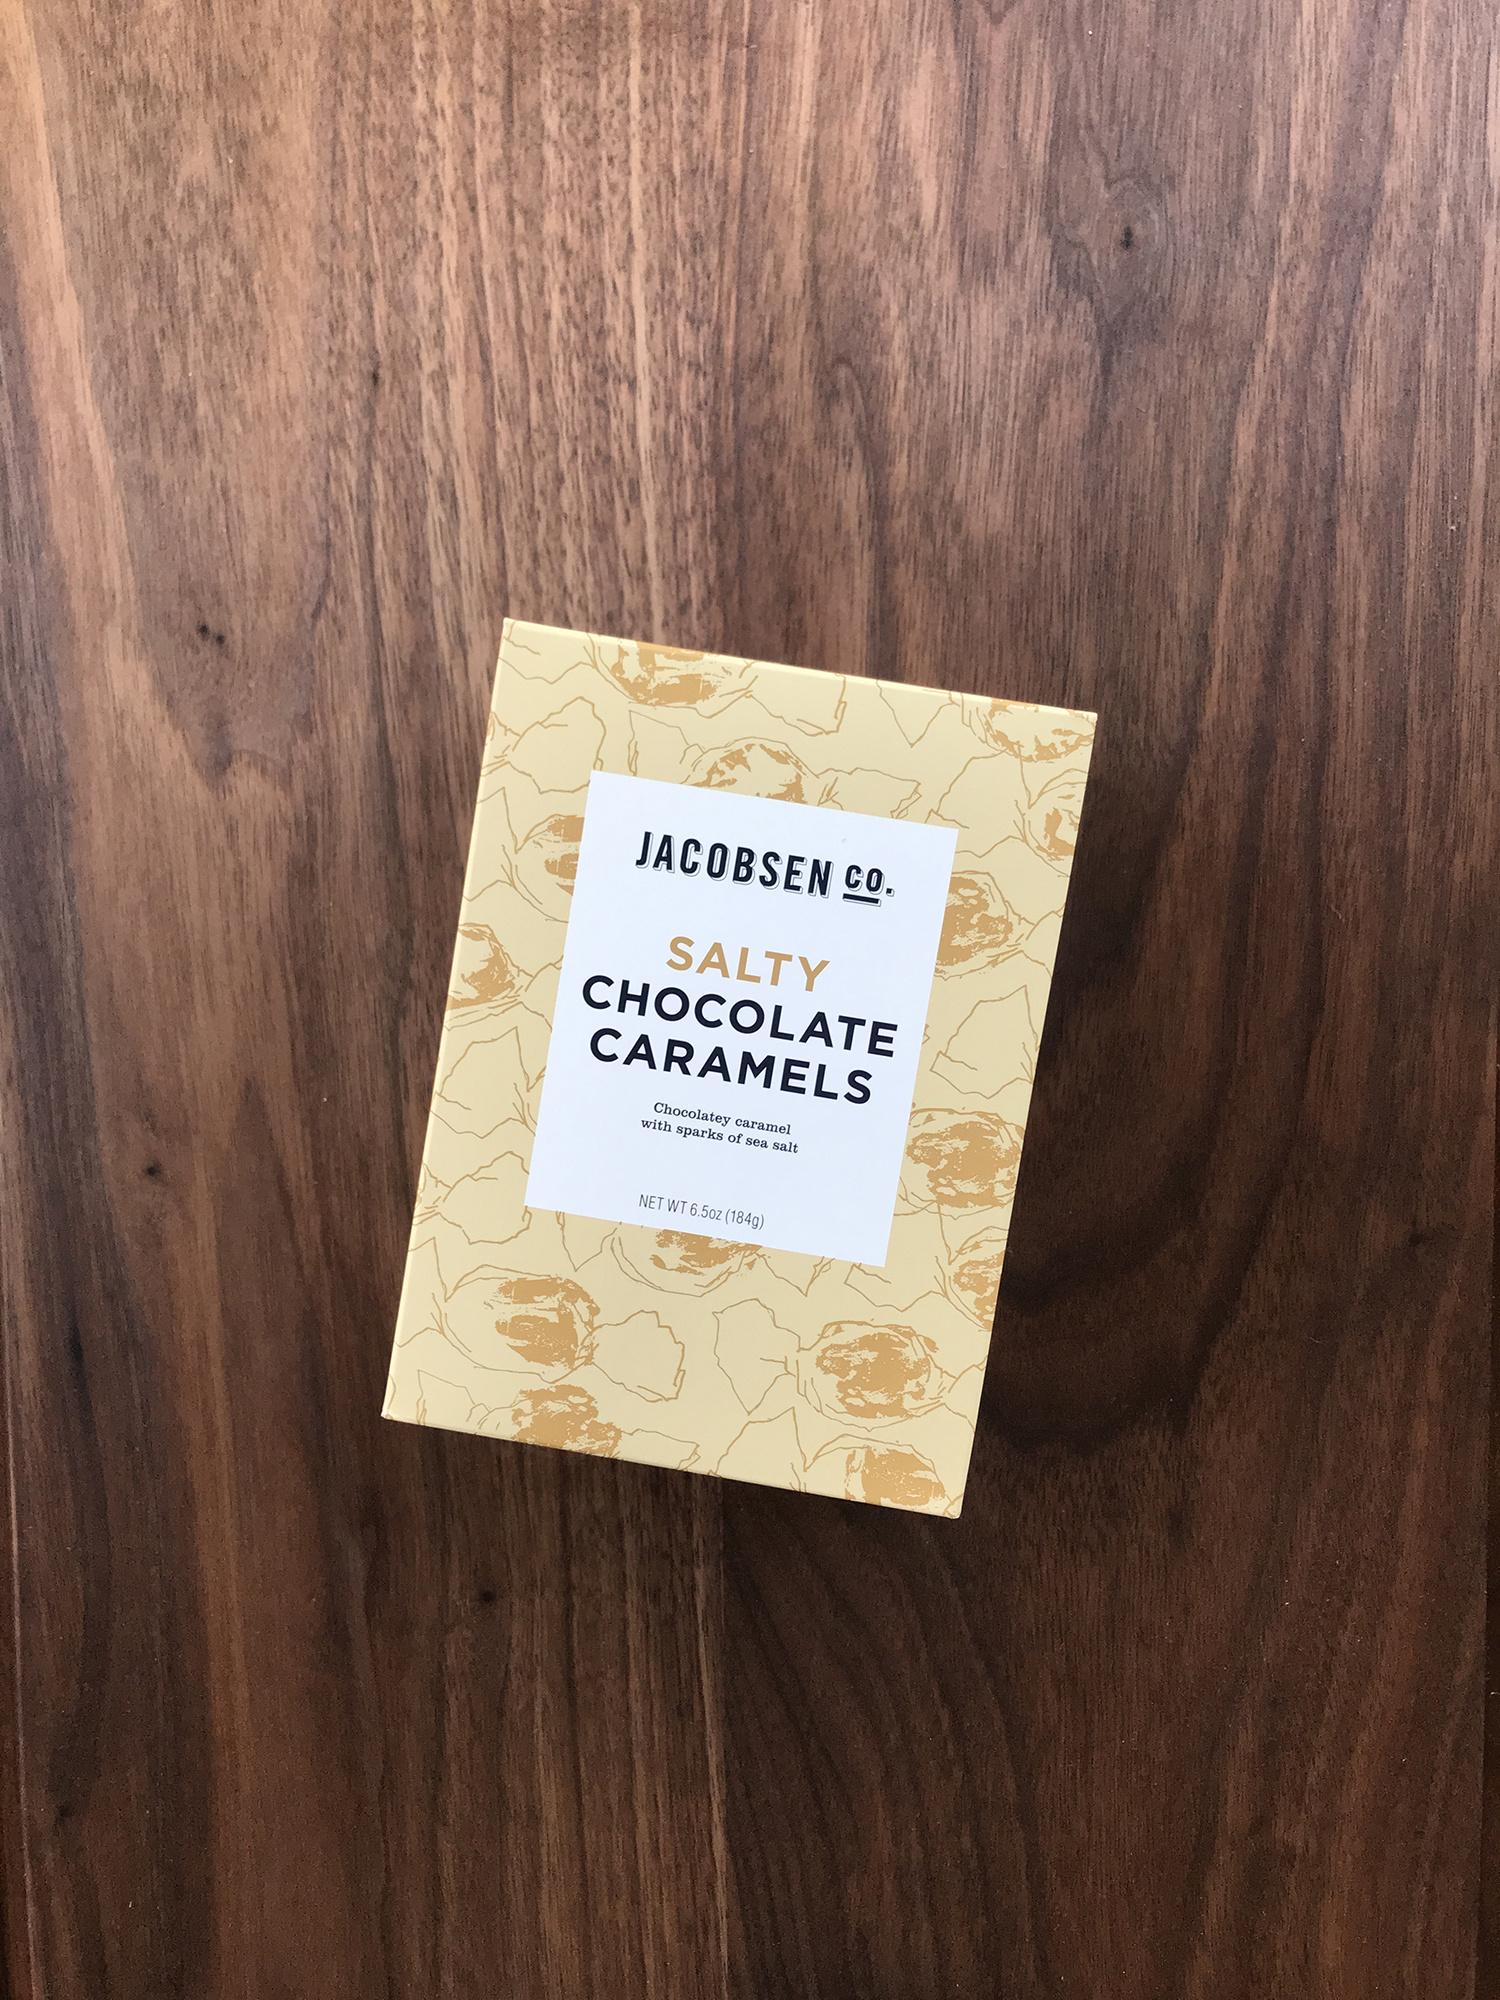 Jacobsen Salty Chocolate Caramels, 6.5 oz.-1